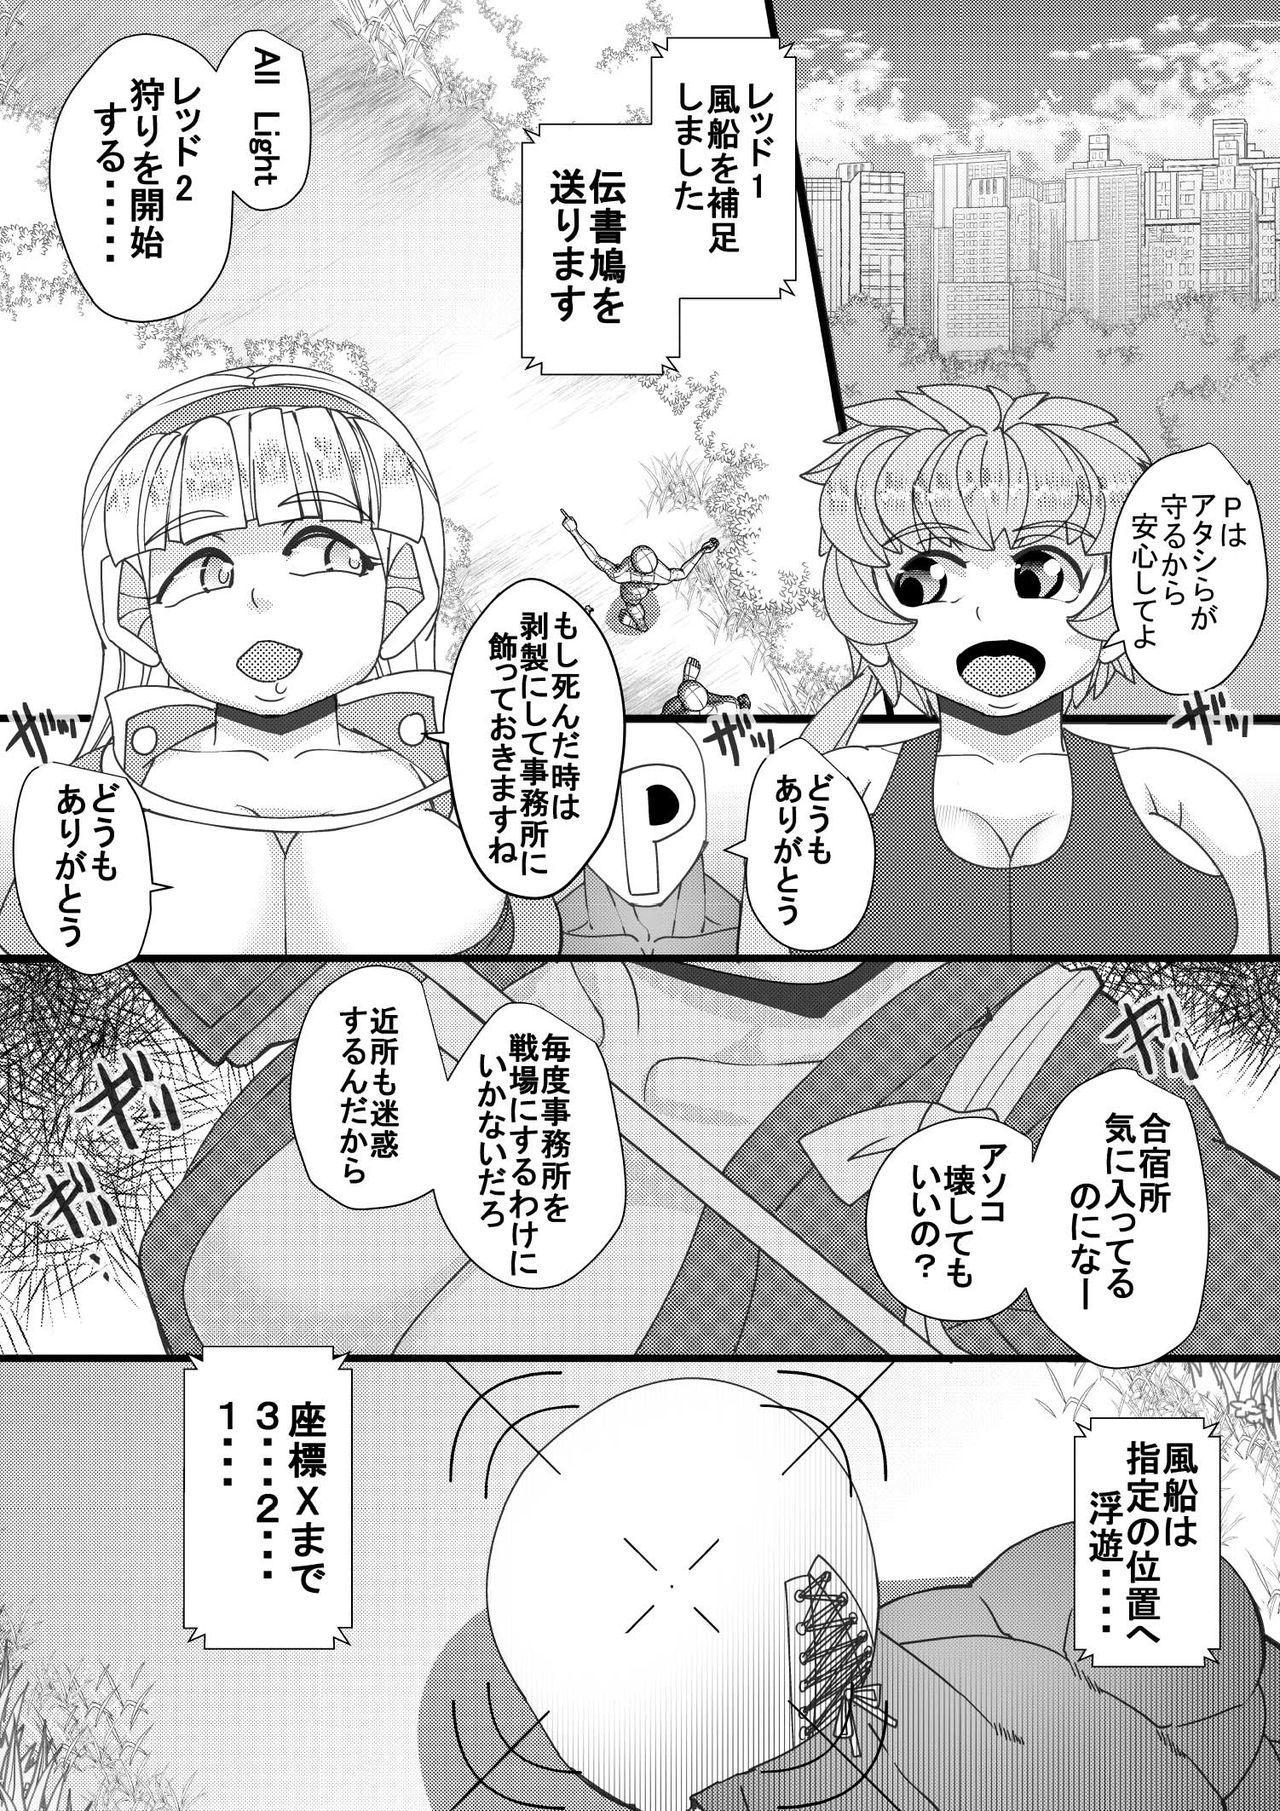 Haramachi 8 2